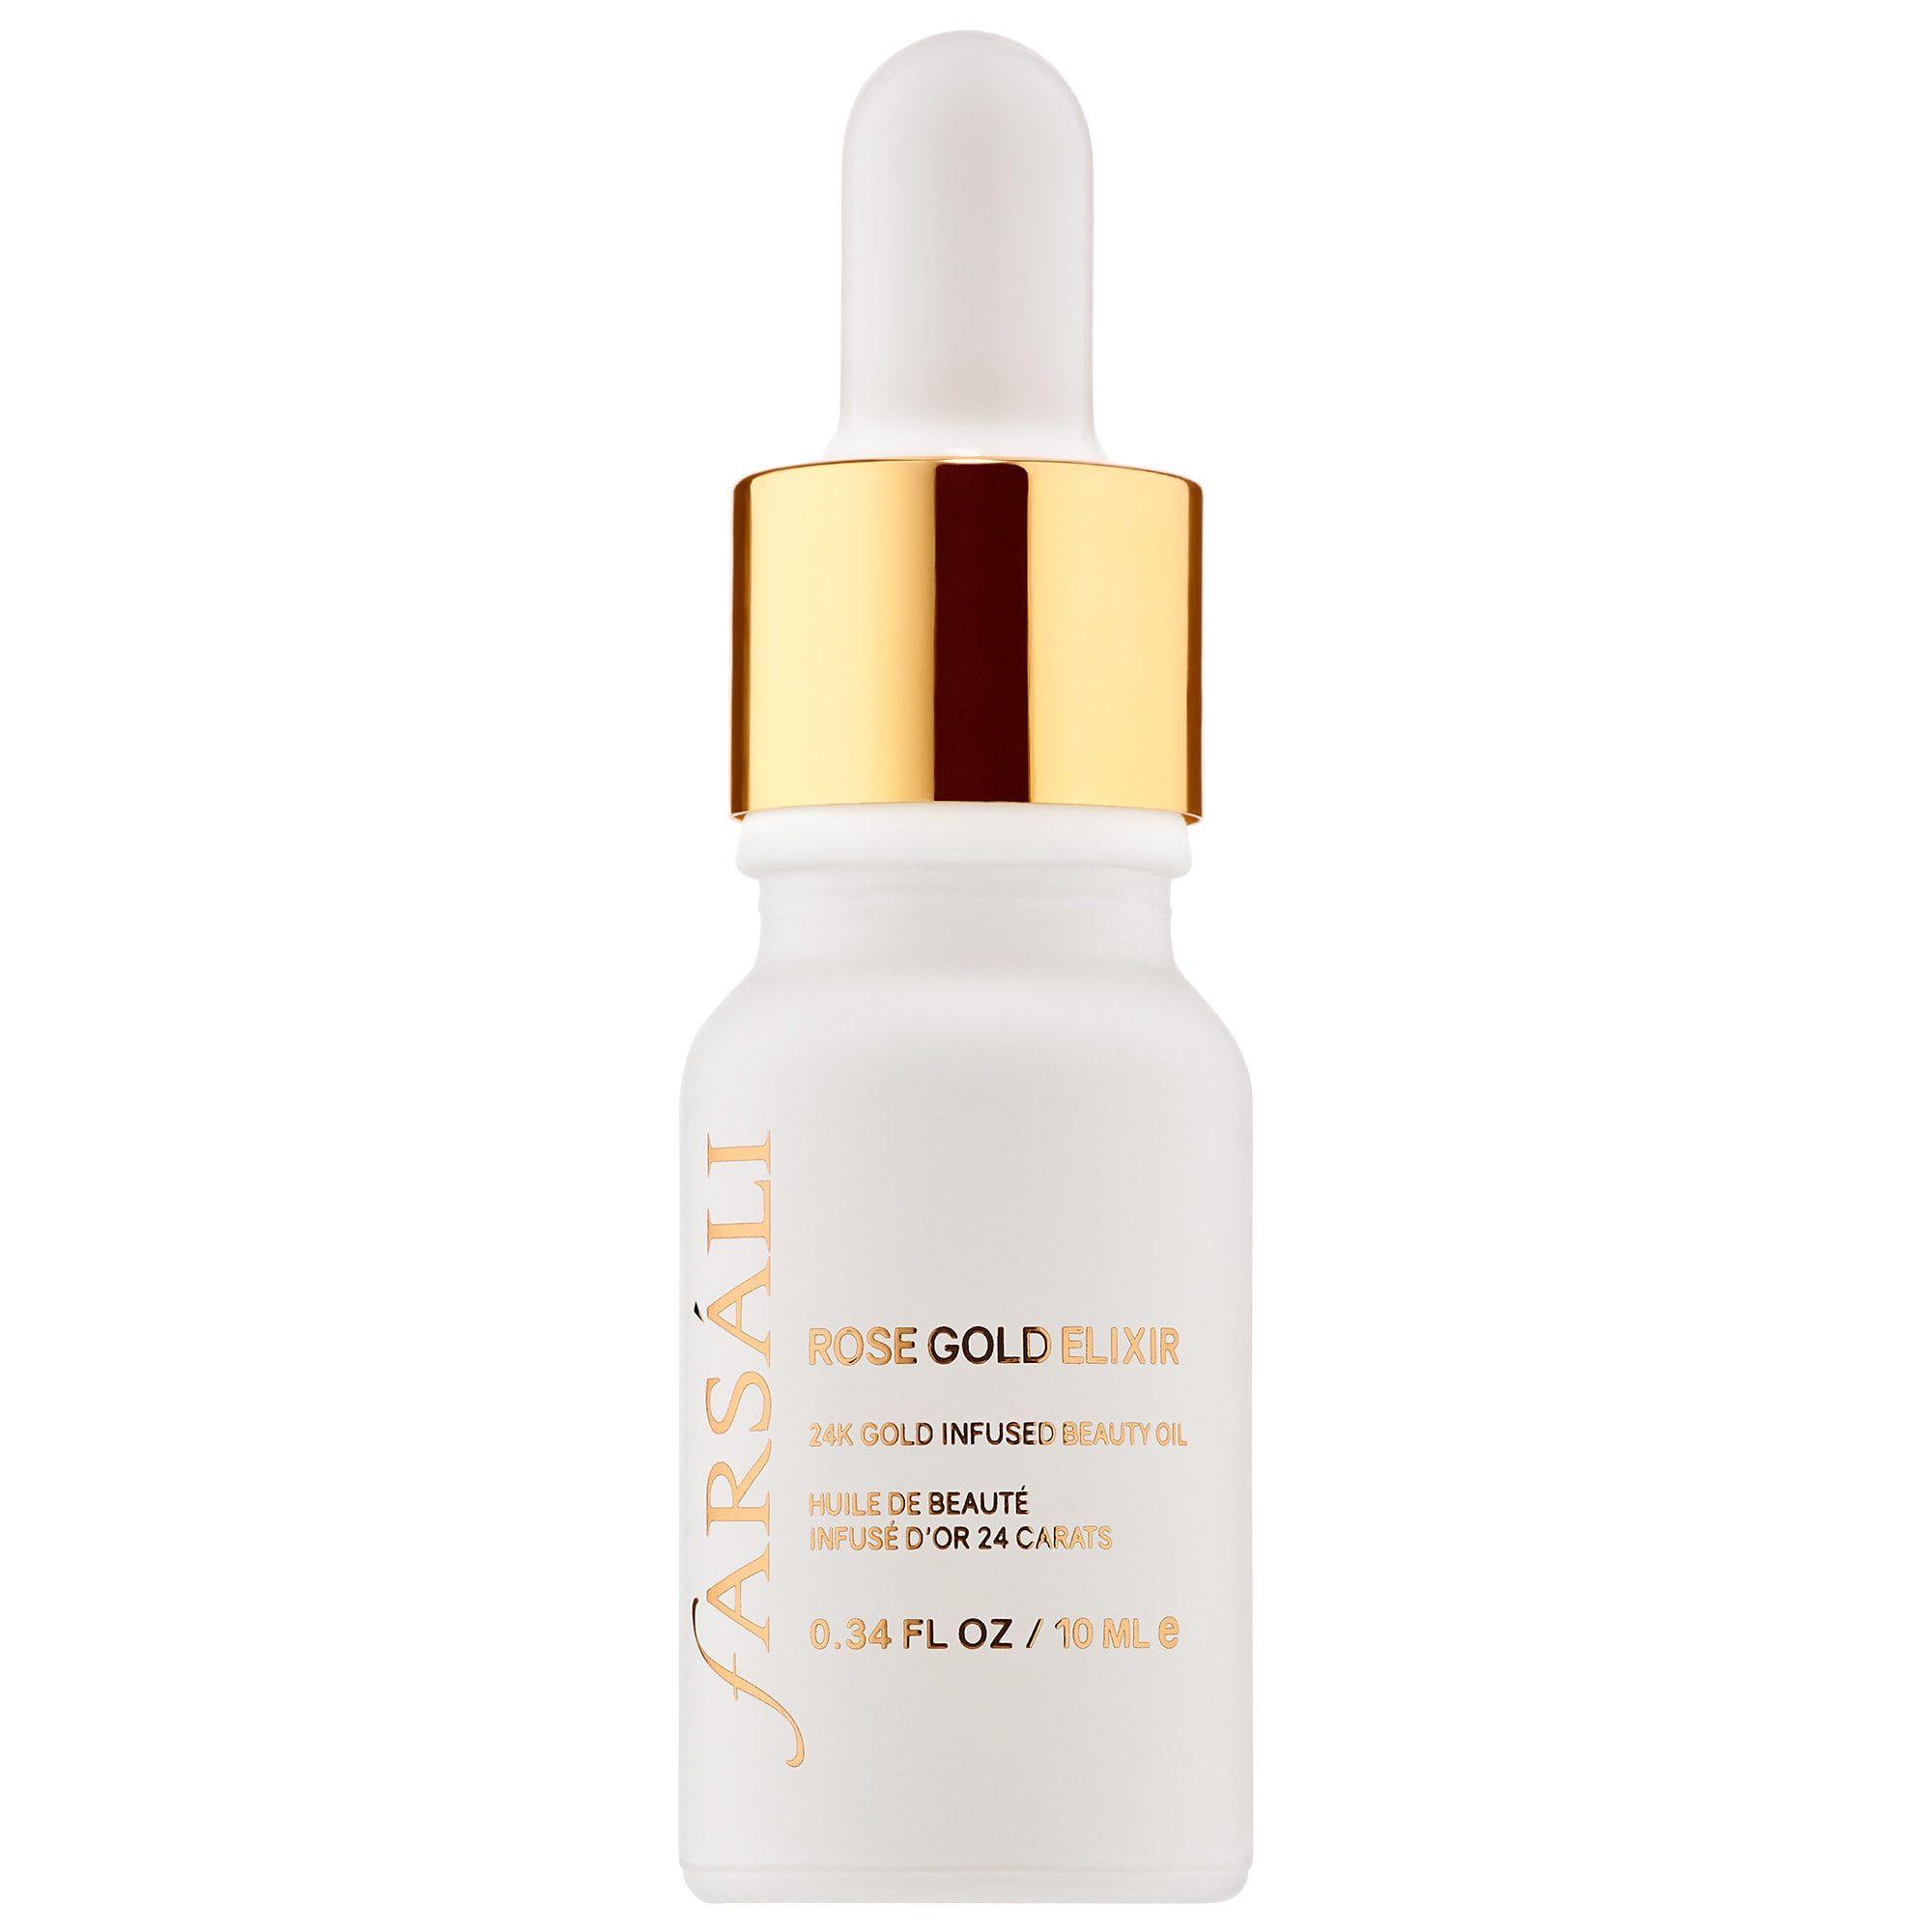 Rose Gold Elixir 24k Gold Infused Beauty Oil Mini Farsali Sephora Rose Gold Elixir Beauty Oil Sephora